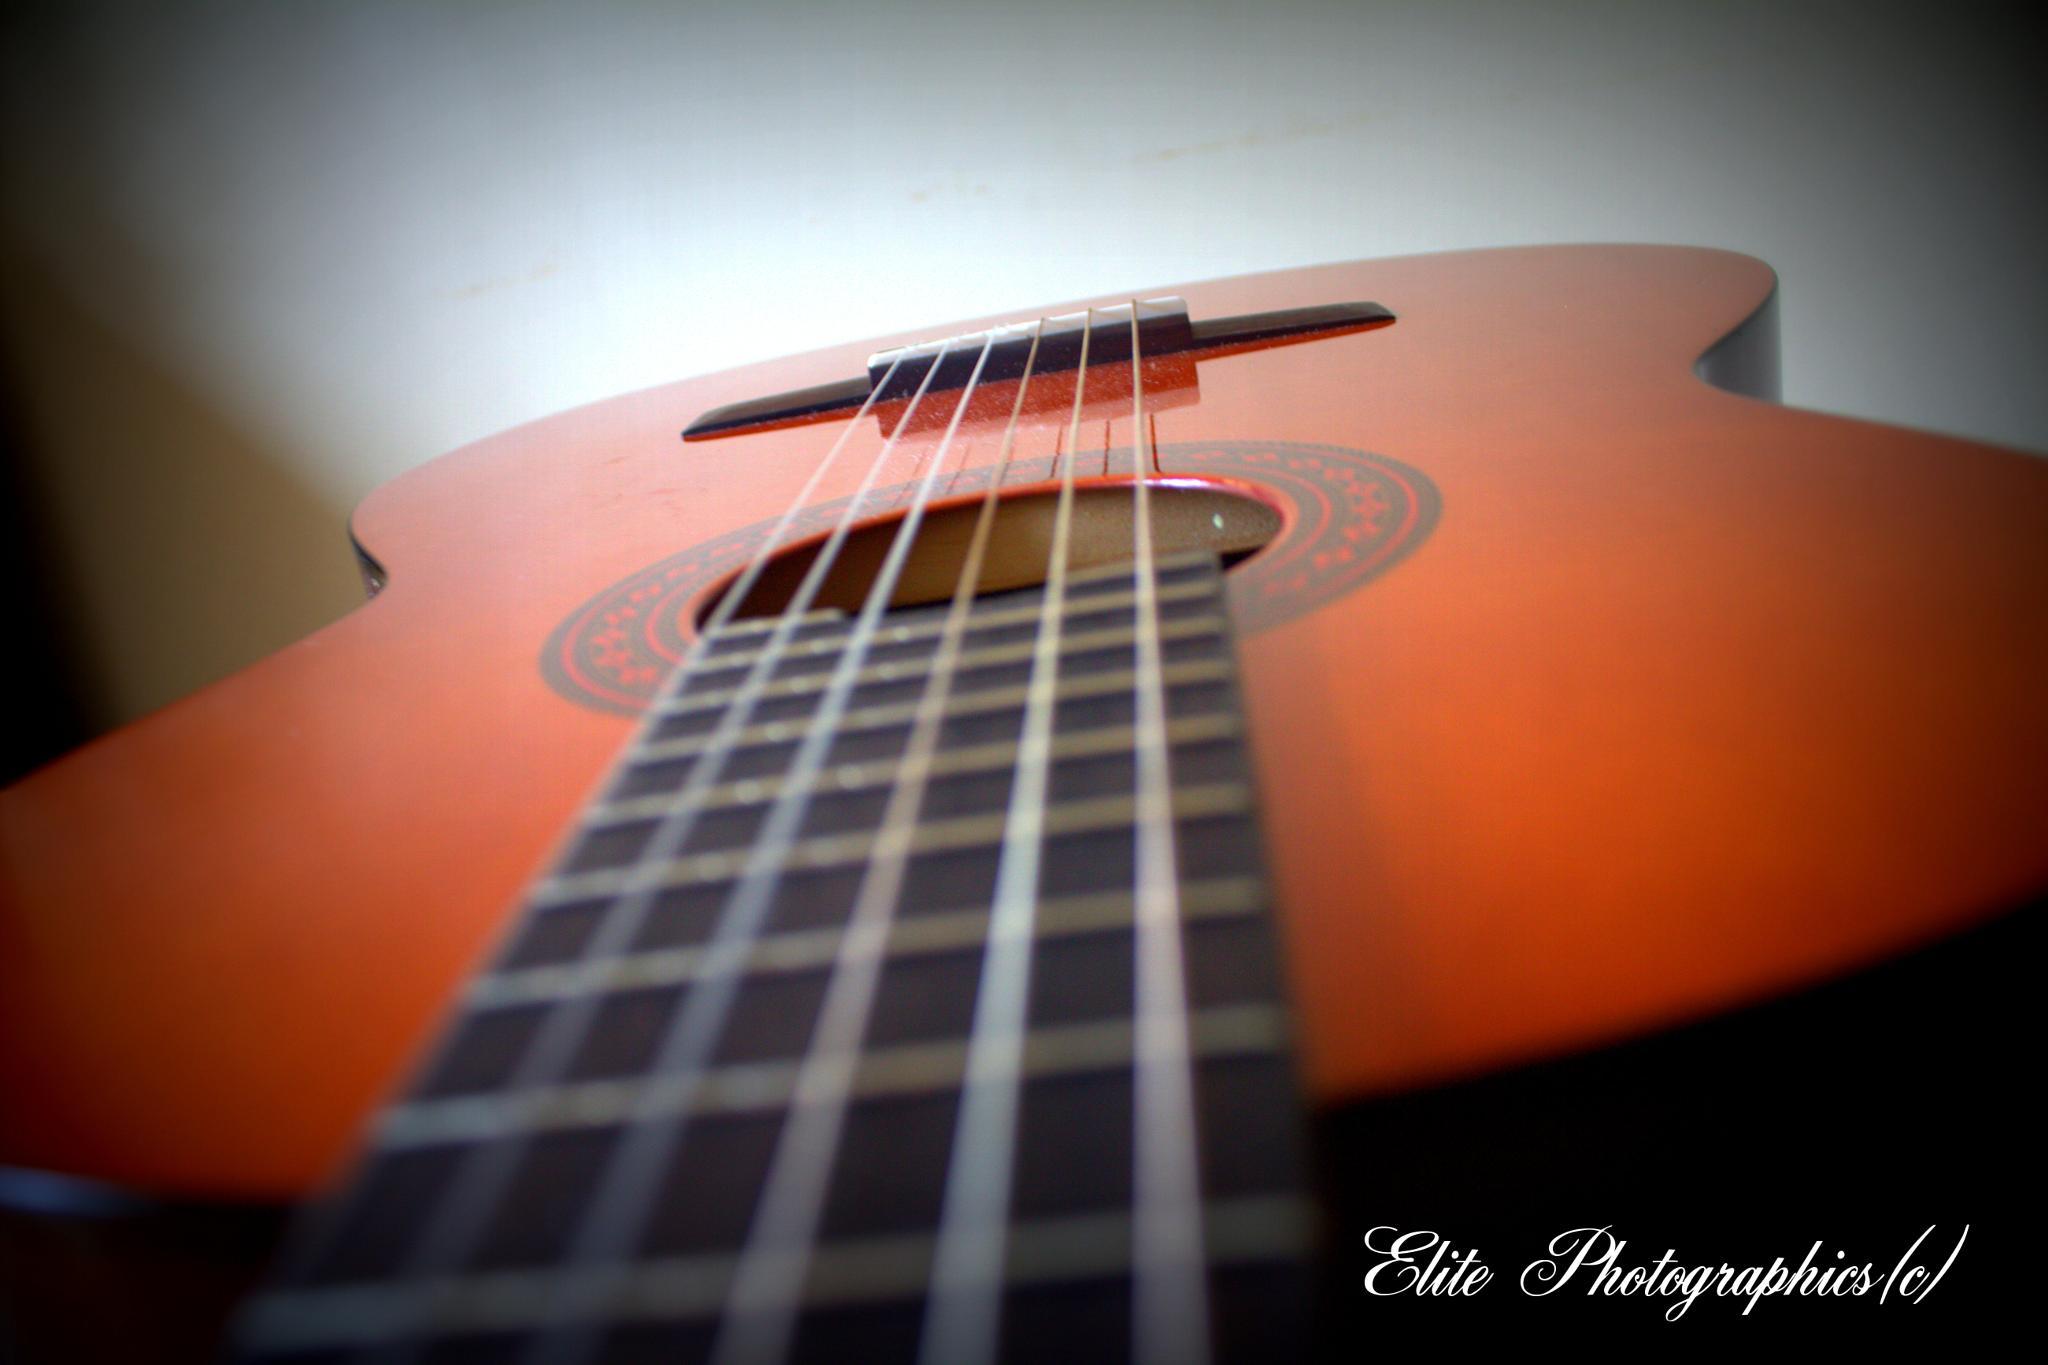 Guitars by LISA WEBB